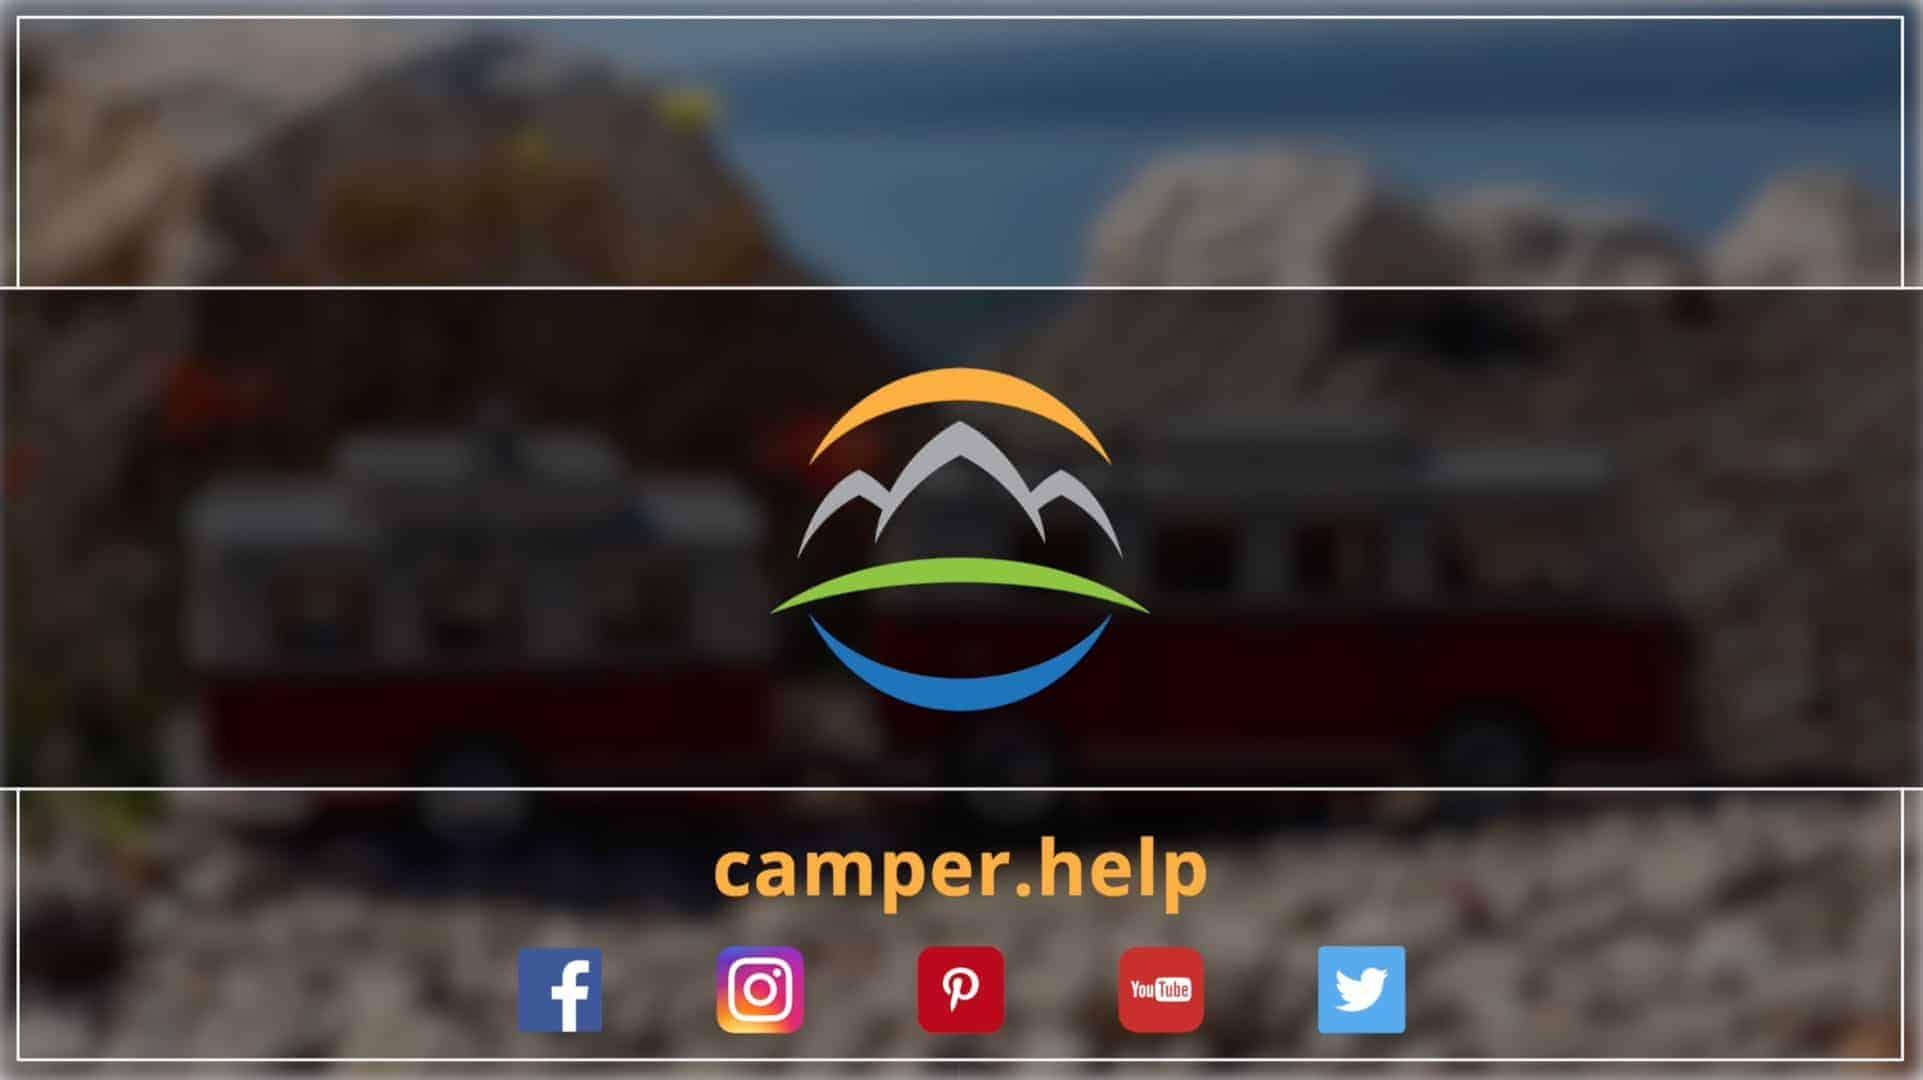 camper_help_intro